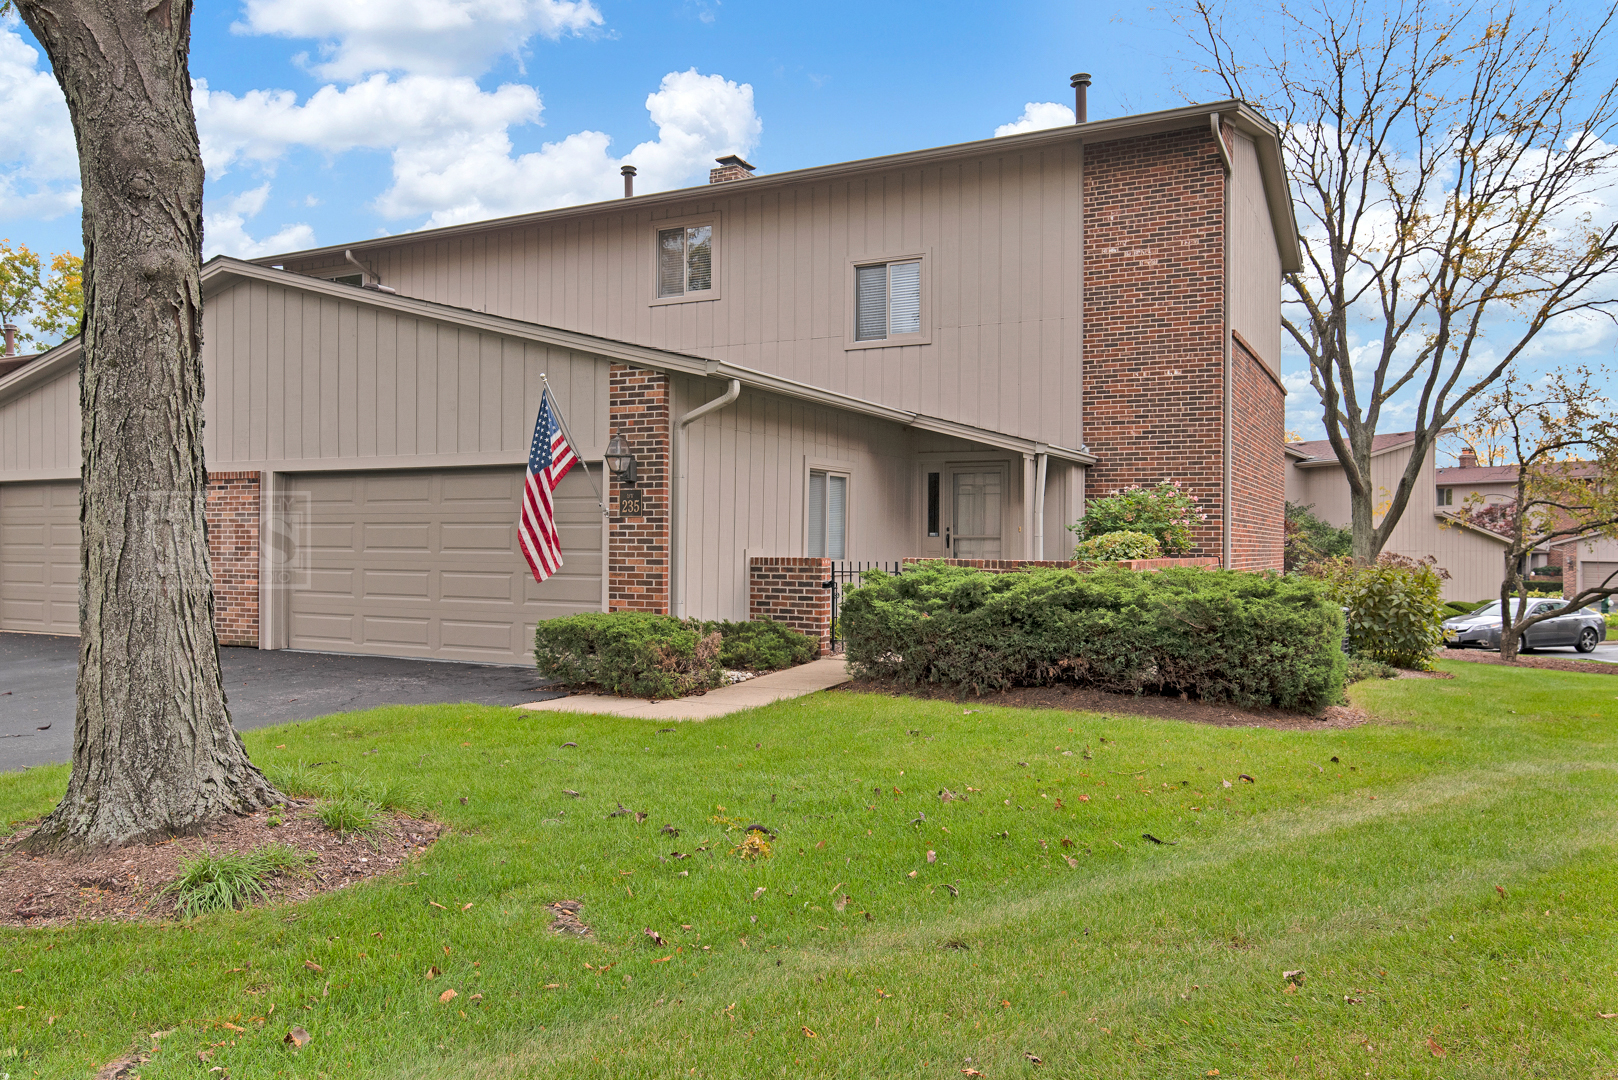 19W235 GINGERBROOK 235, Oak Brook, Illinois, 60523